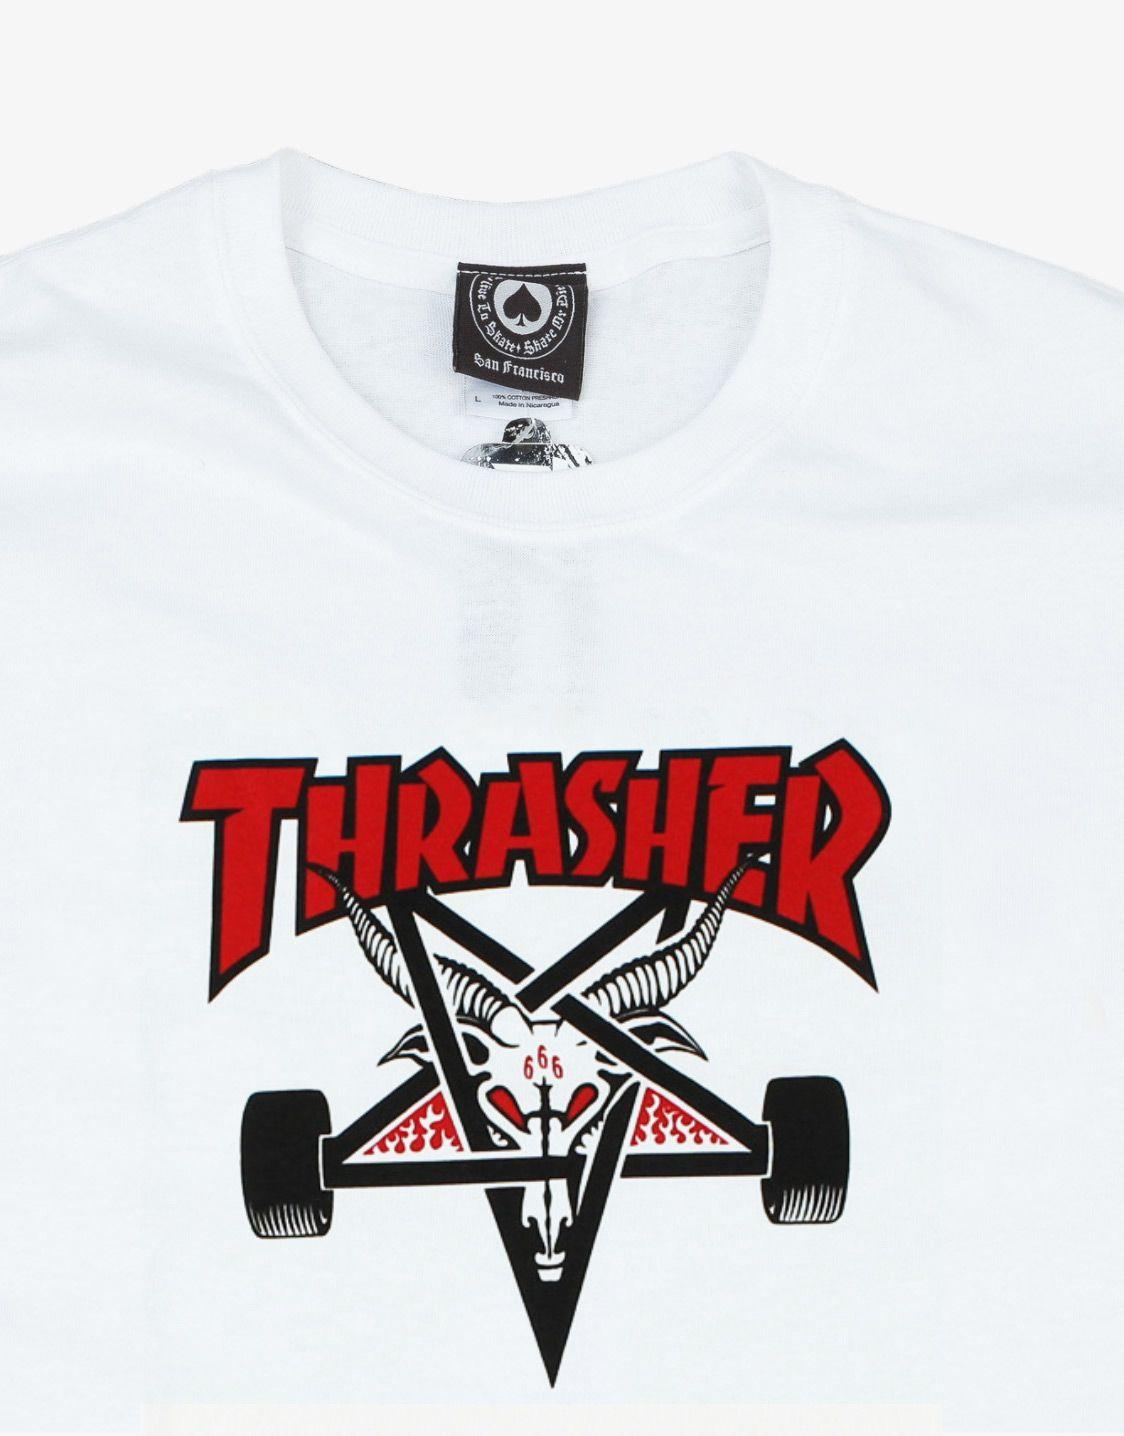 c11585a2845b Thrasher Magazine Skategoat two tone t-shirt | เสื้อยืด | Thrasher ...